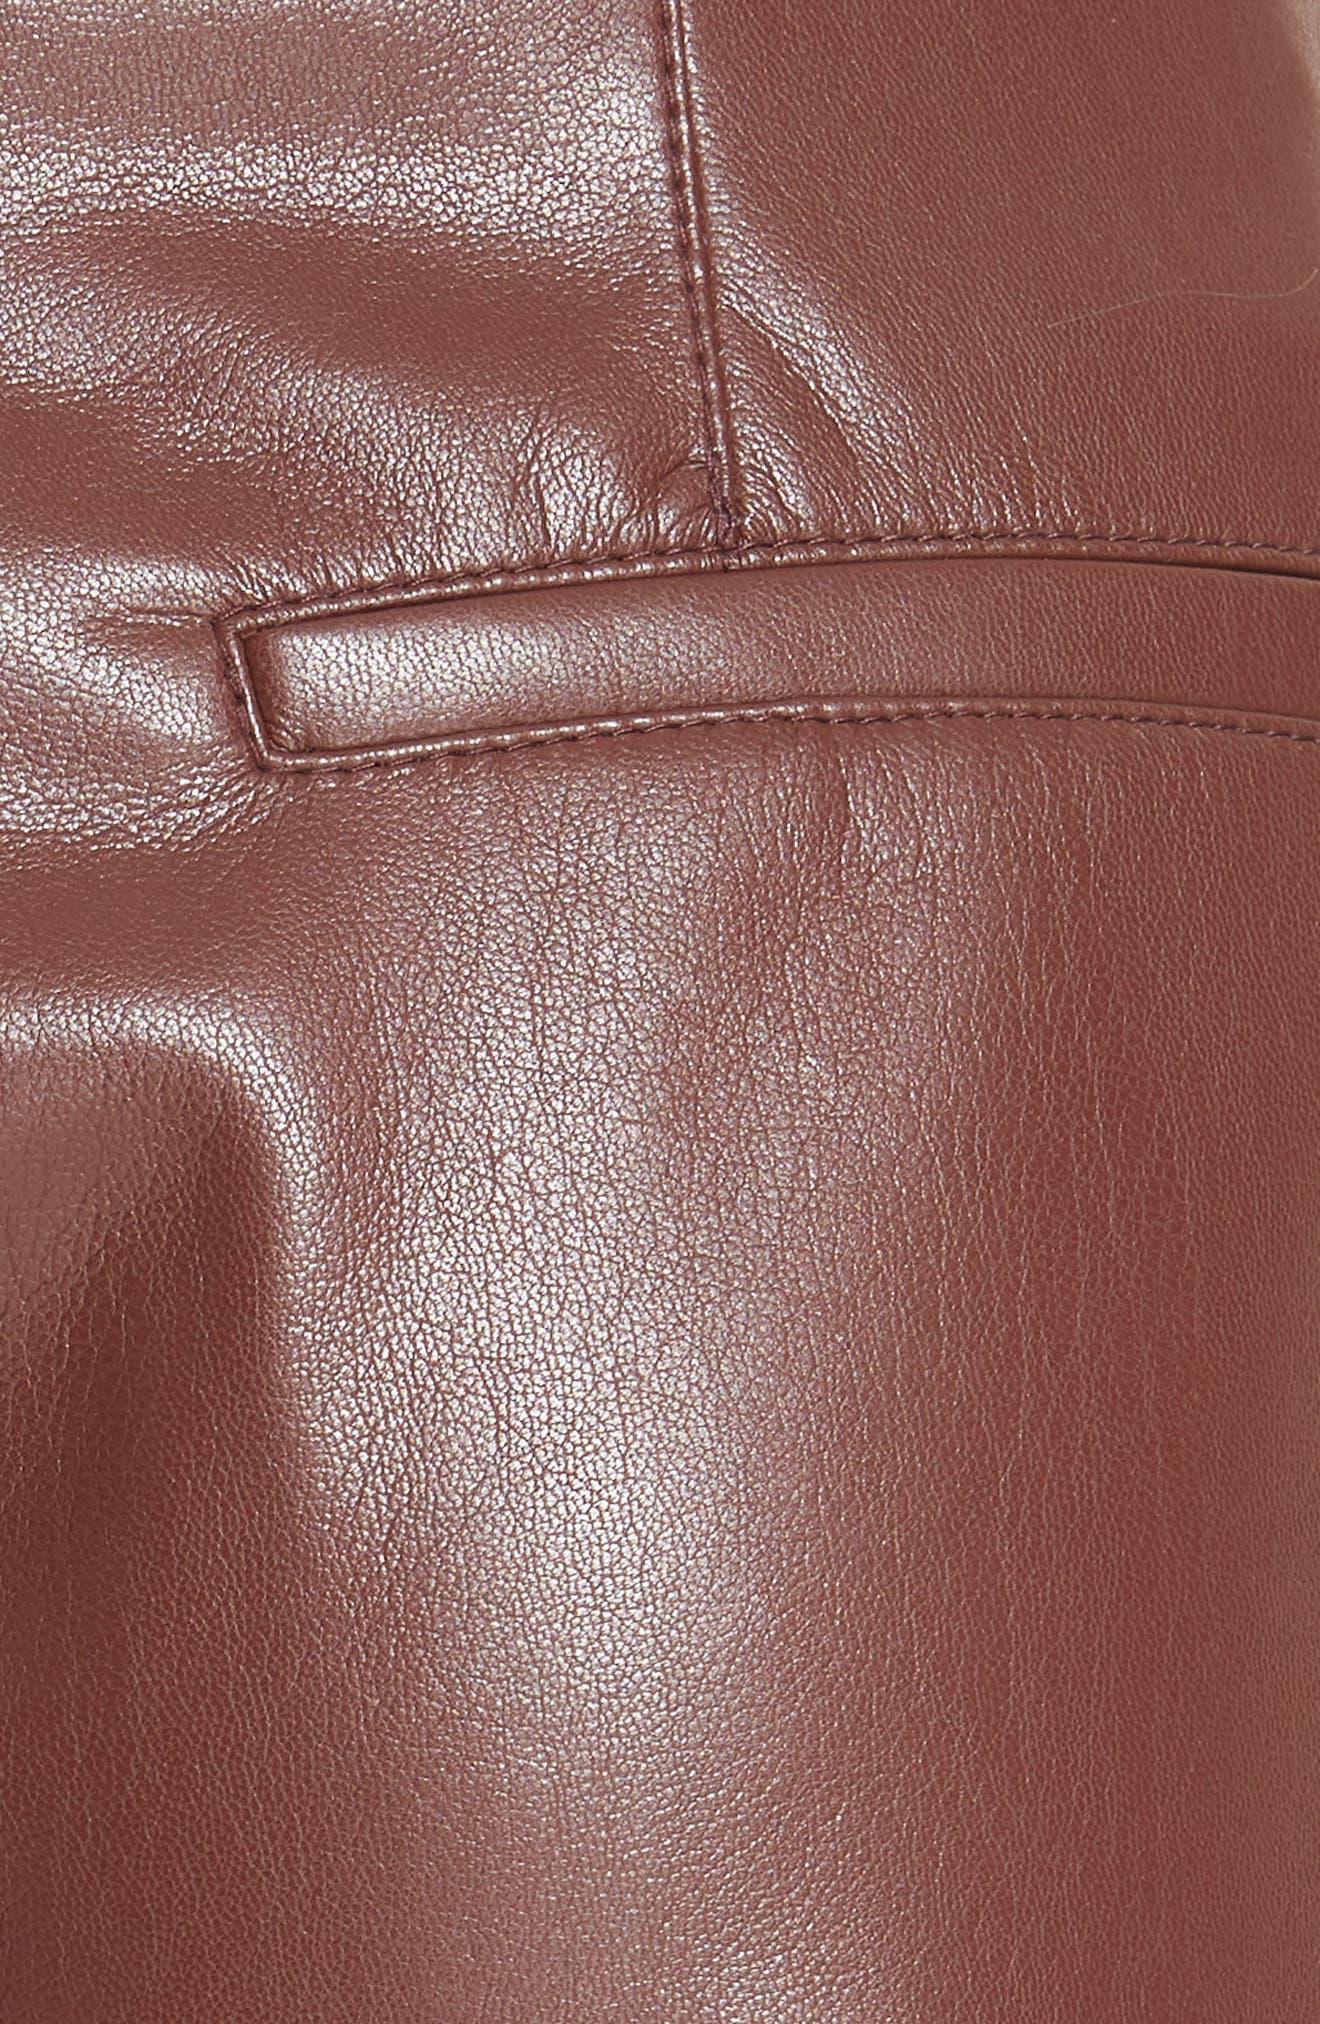 Africa Faux Leather Wide Leg Crop Pants,                             Alternate thumbnail 5, color,                             PLUM CHUTNEY